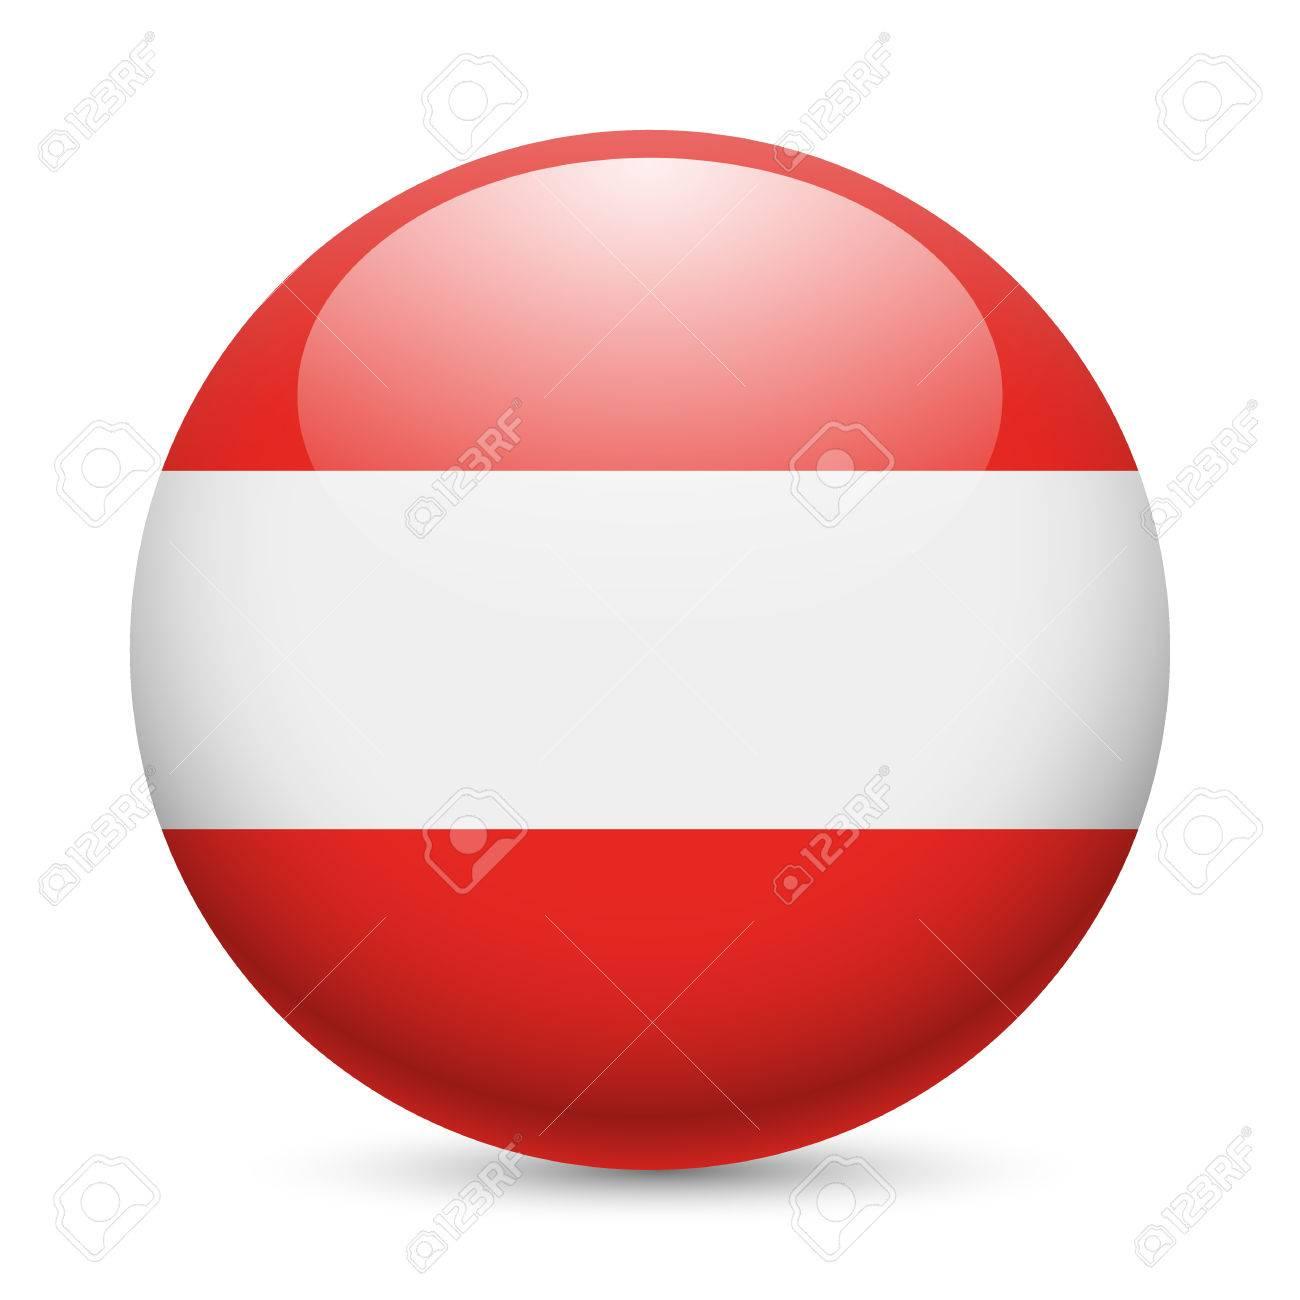 flag of austria as round glossy icon button with austrian flag